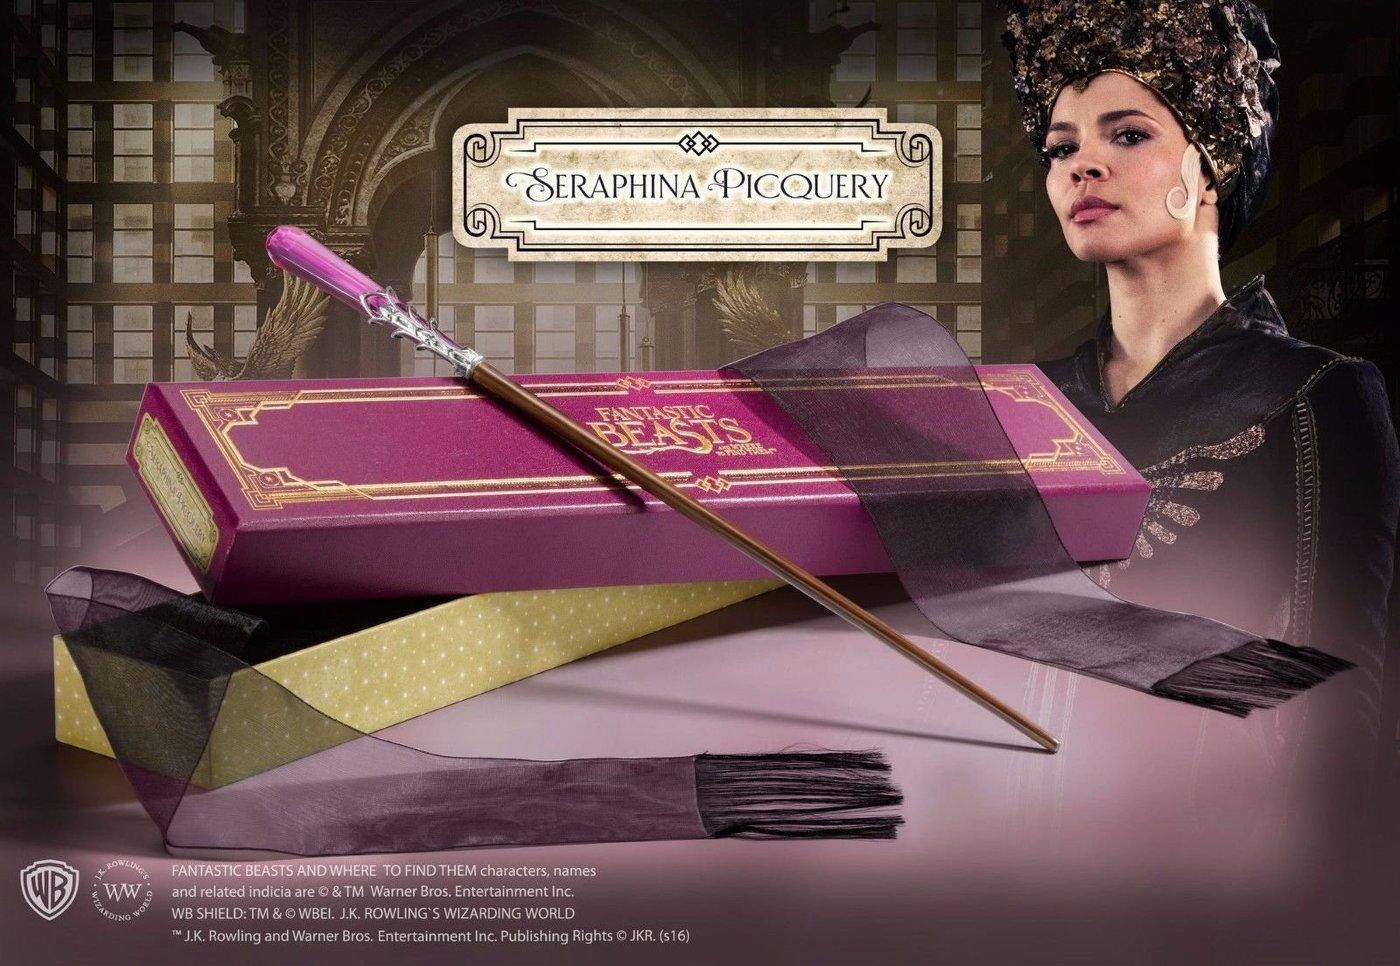 Seraphina Picquery Wand Collector's Box